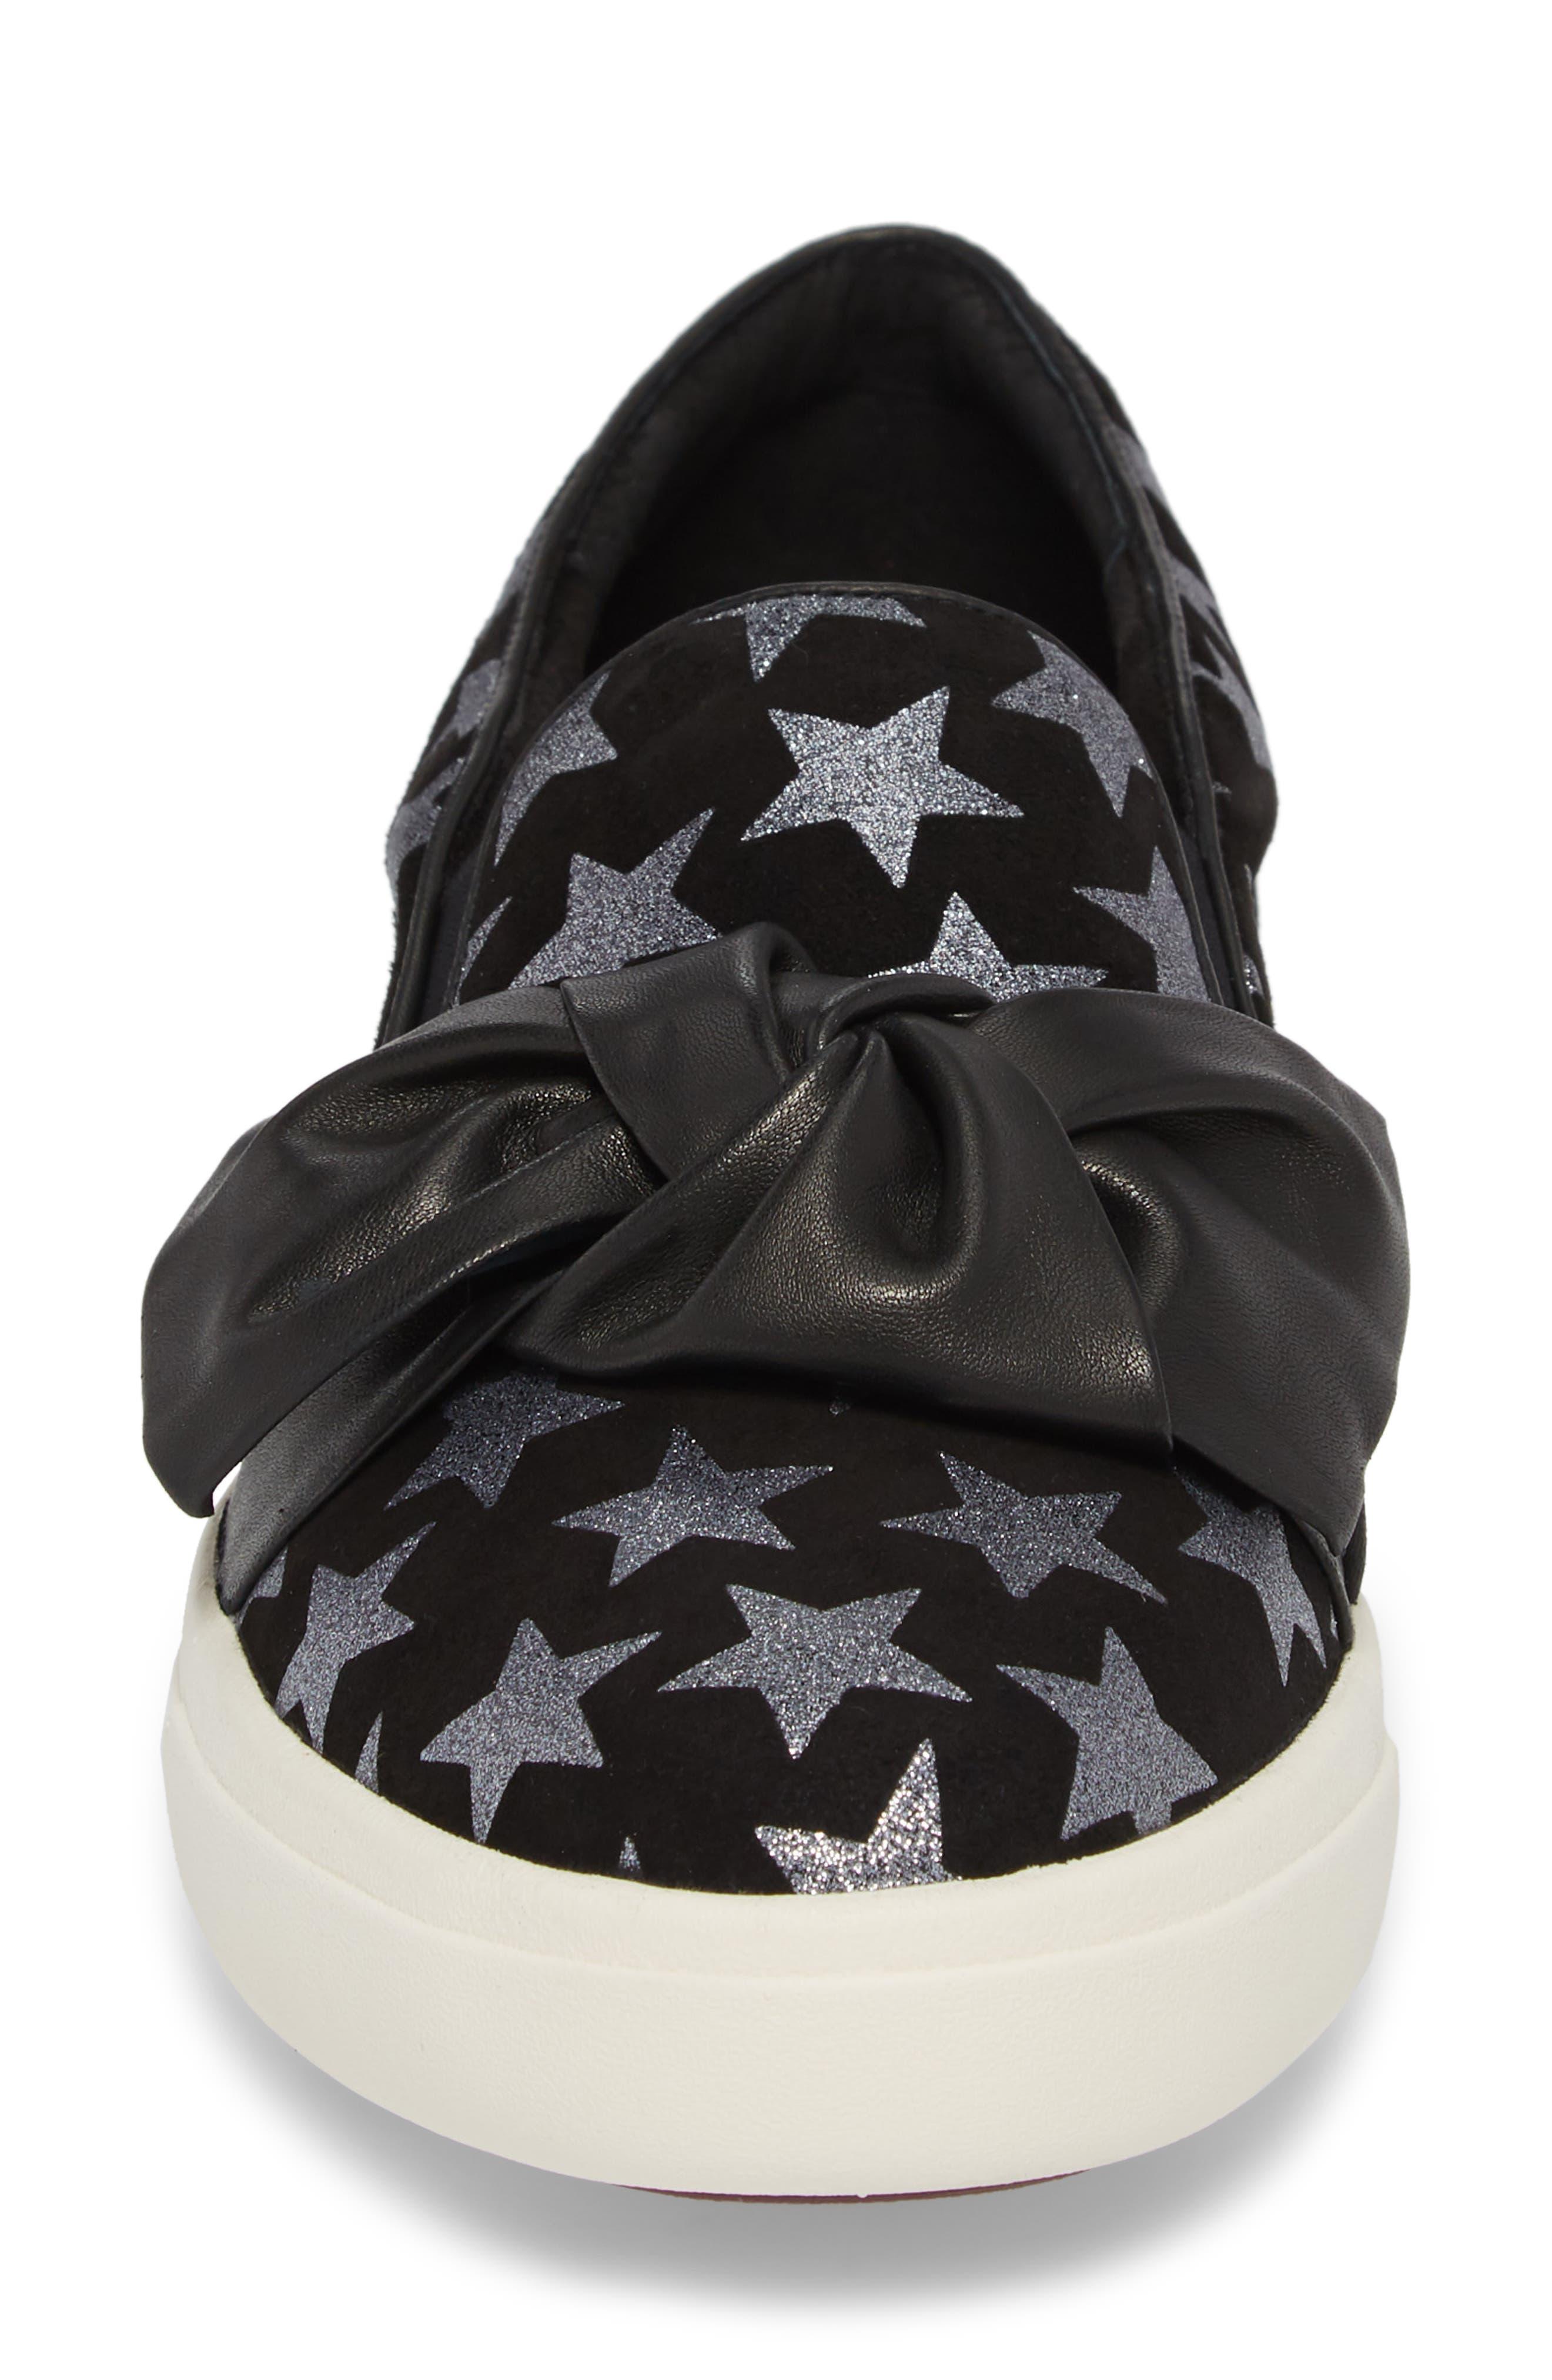 Odelet Slip-On Sneaker,                             Alternate thumbnail 4, color,                             BLACK/ PEWTER SUEDE